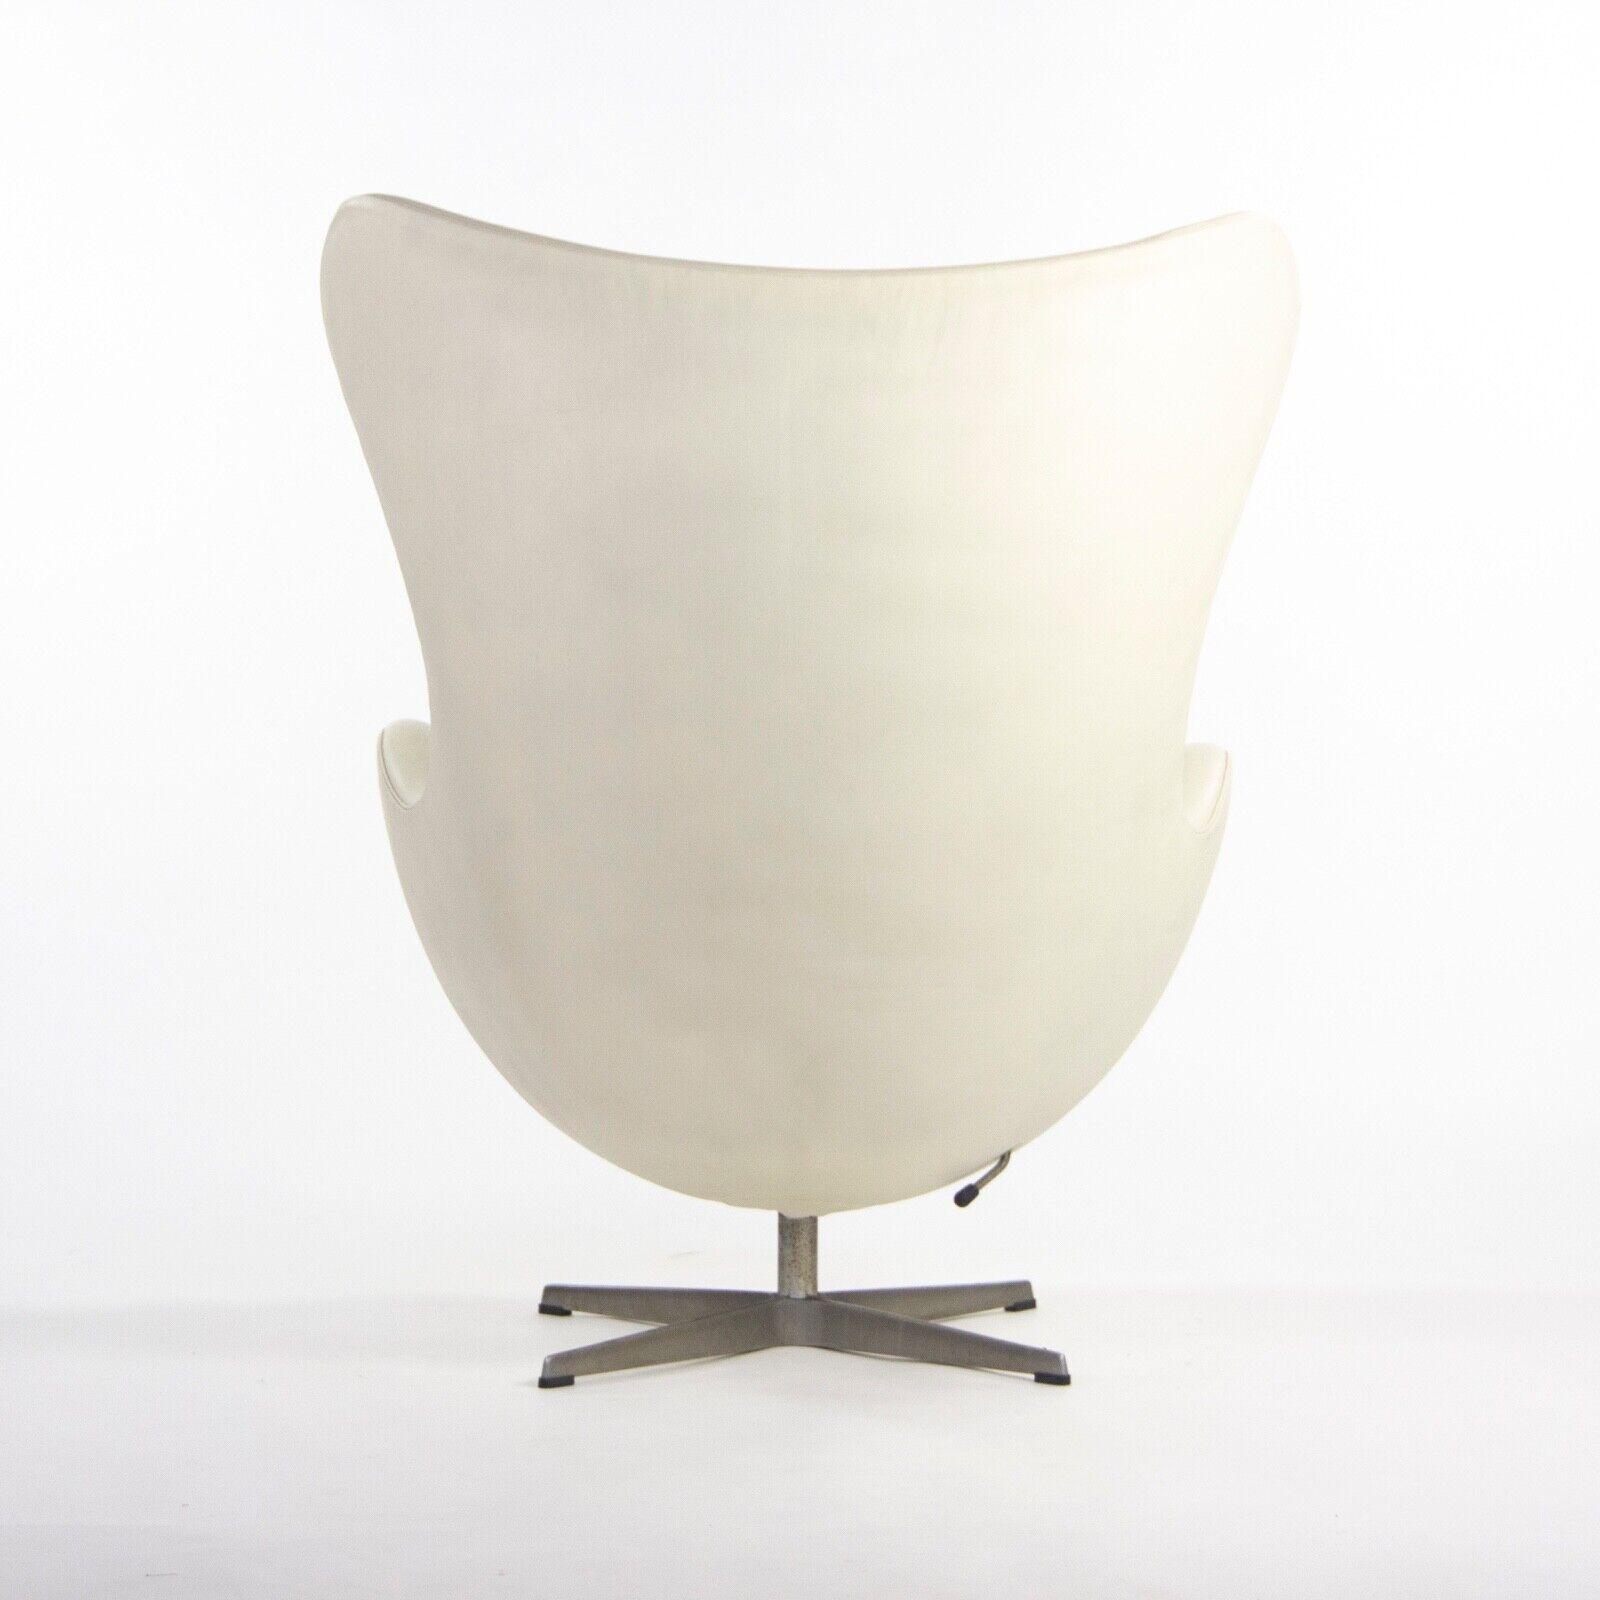 Firmato 1998 Arne Jacobsen Per Fritz Hansen pelle Bianca Uova Sedia Con Ottomano,Arne JACOBSEN(6)